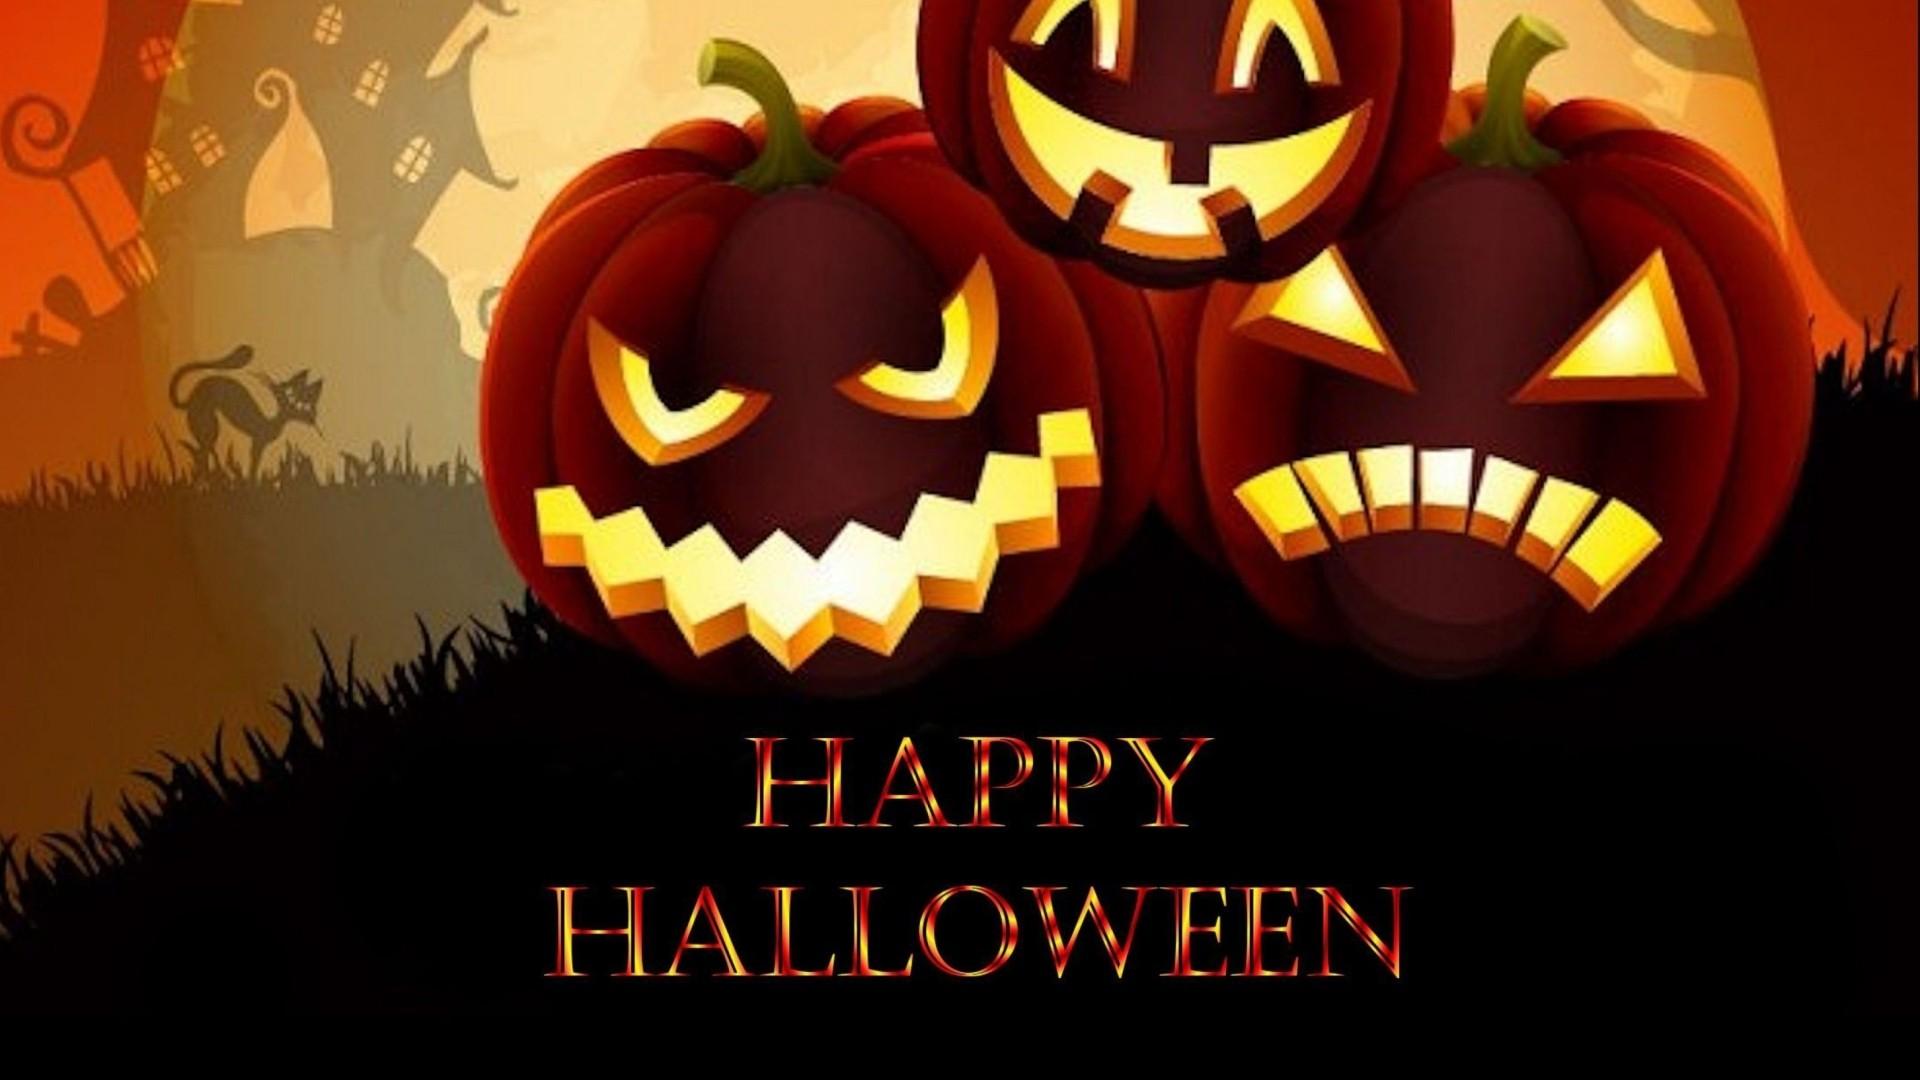 Halloween Greeting Card PC Wallpaper